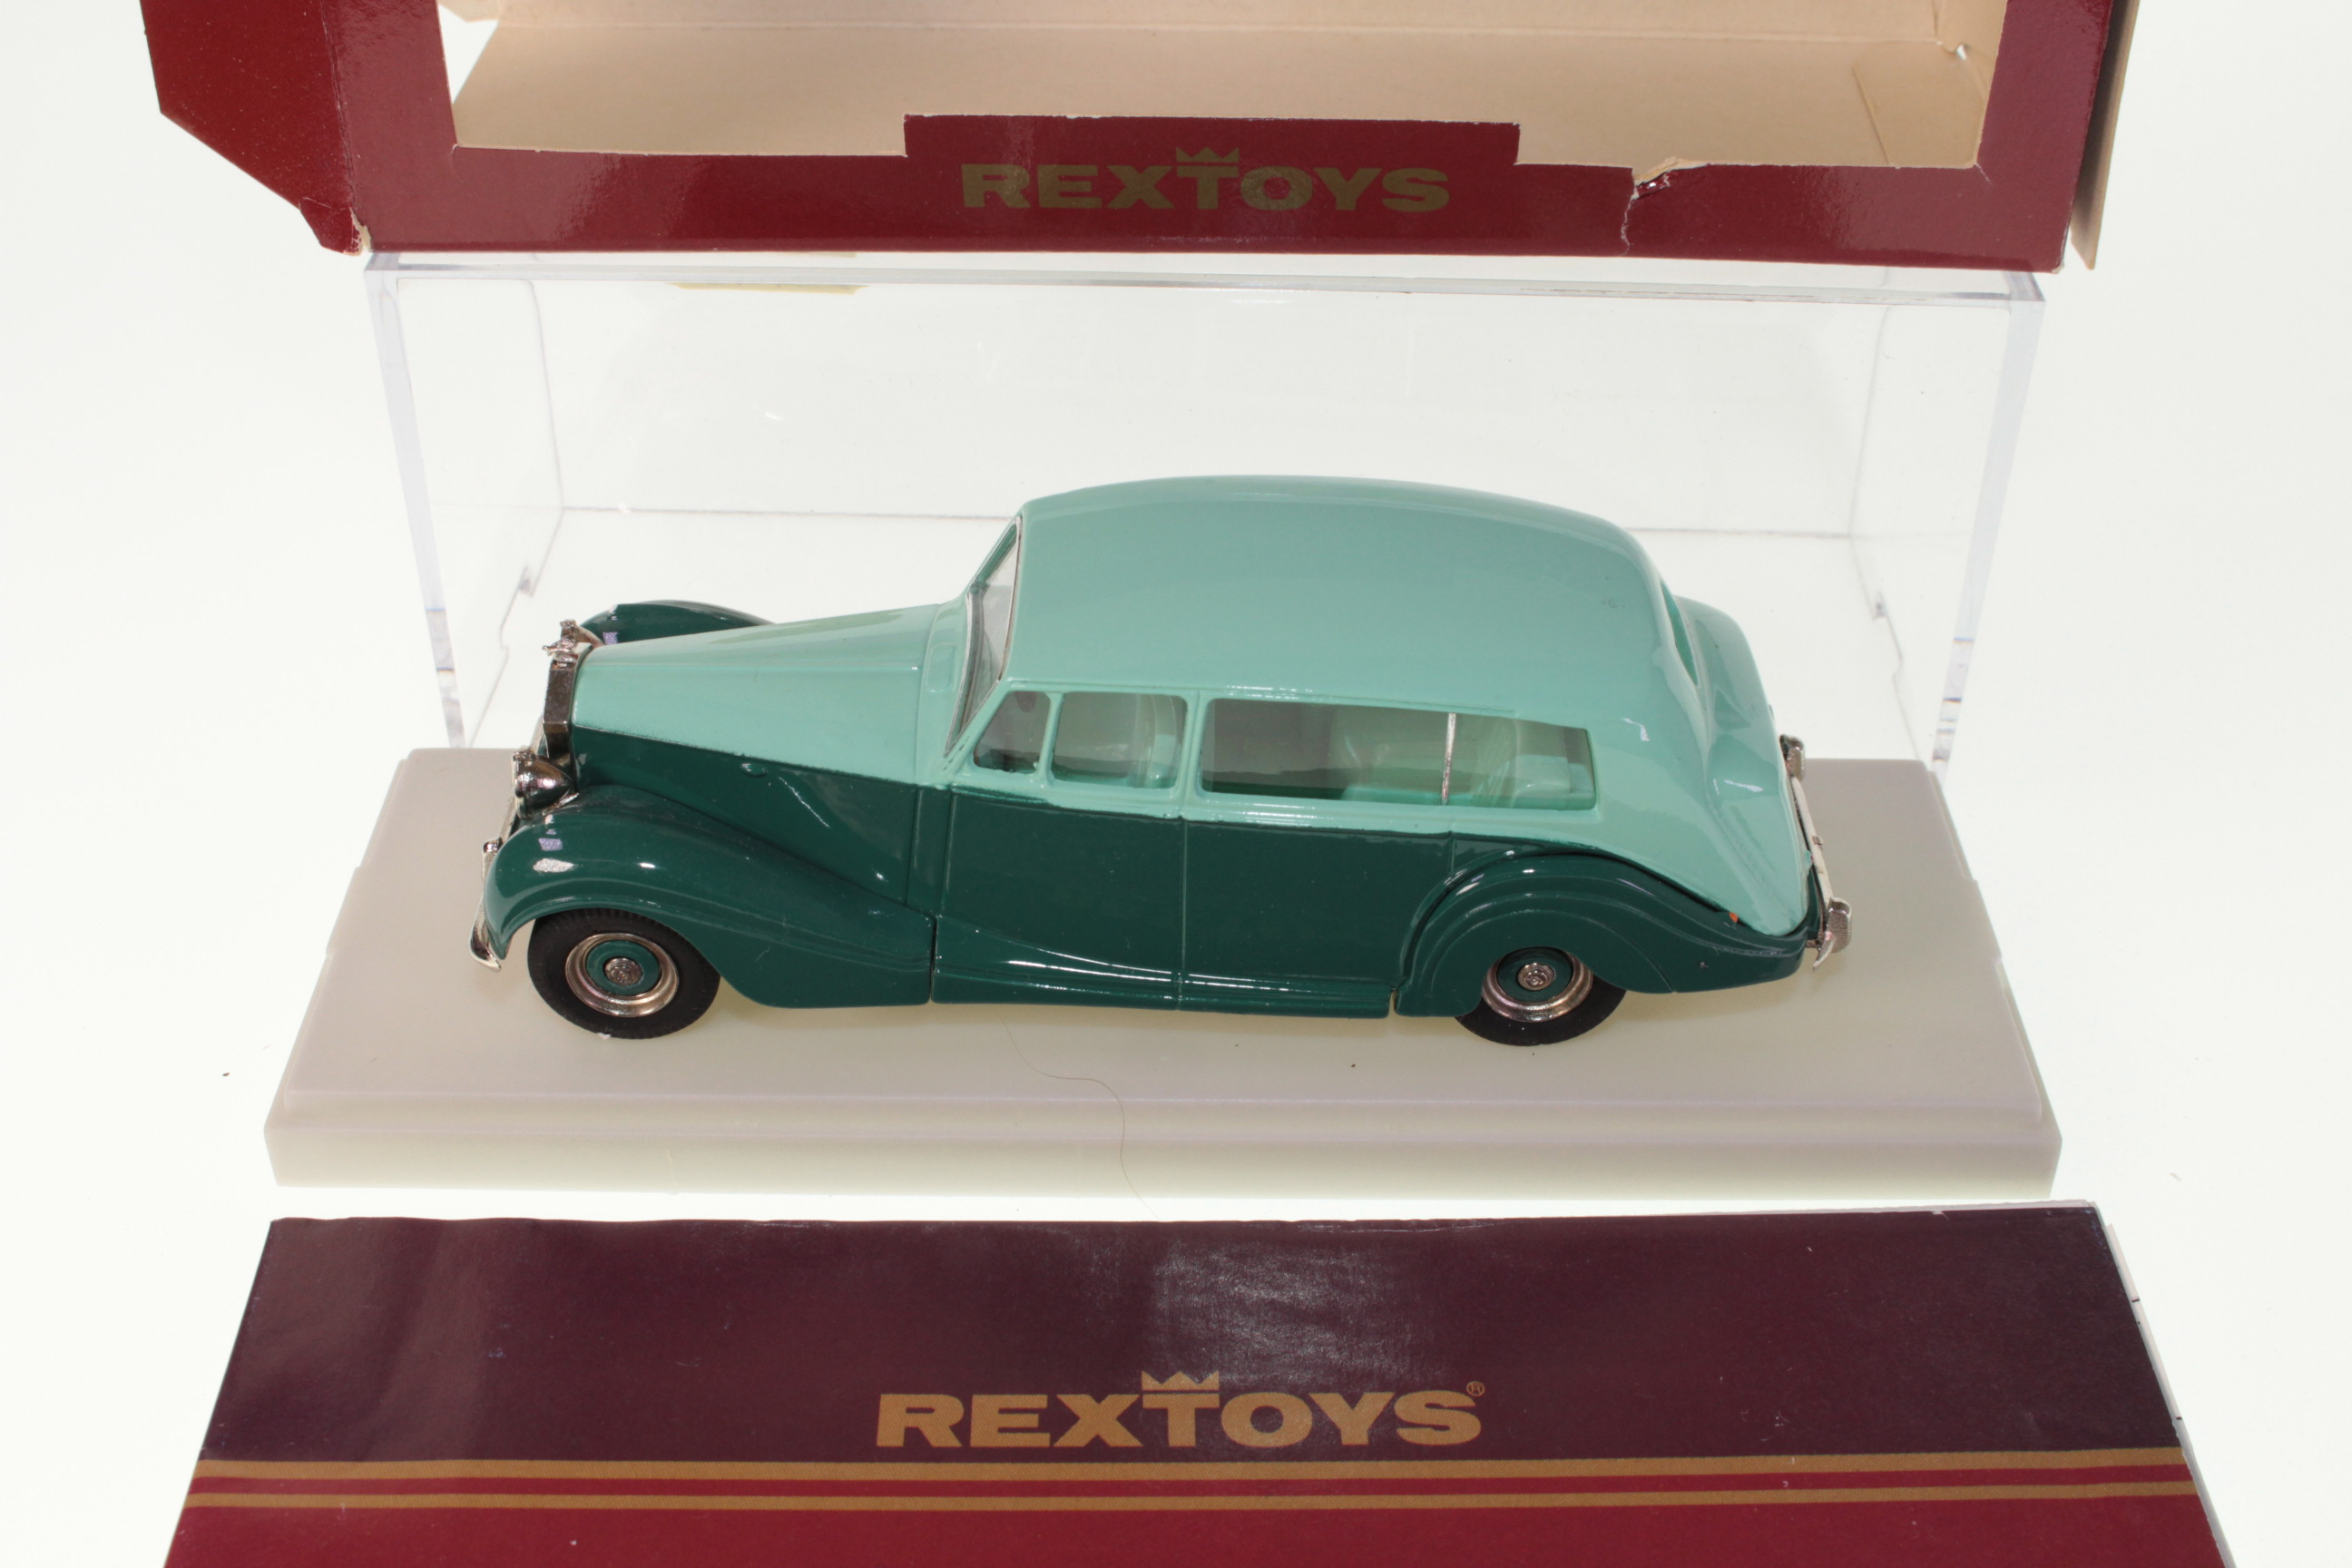 Rextoys 33, Rolls Royce Phantom IV - Buy, Sell, Review & Free Price ...